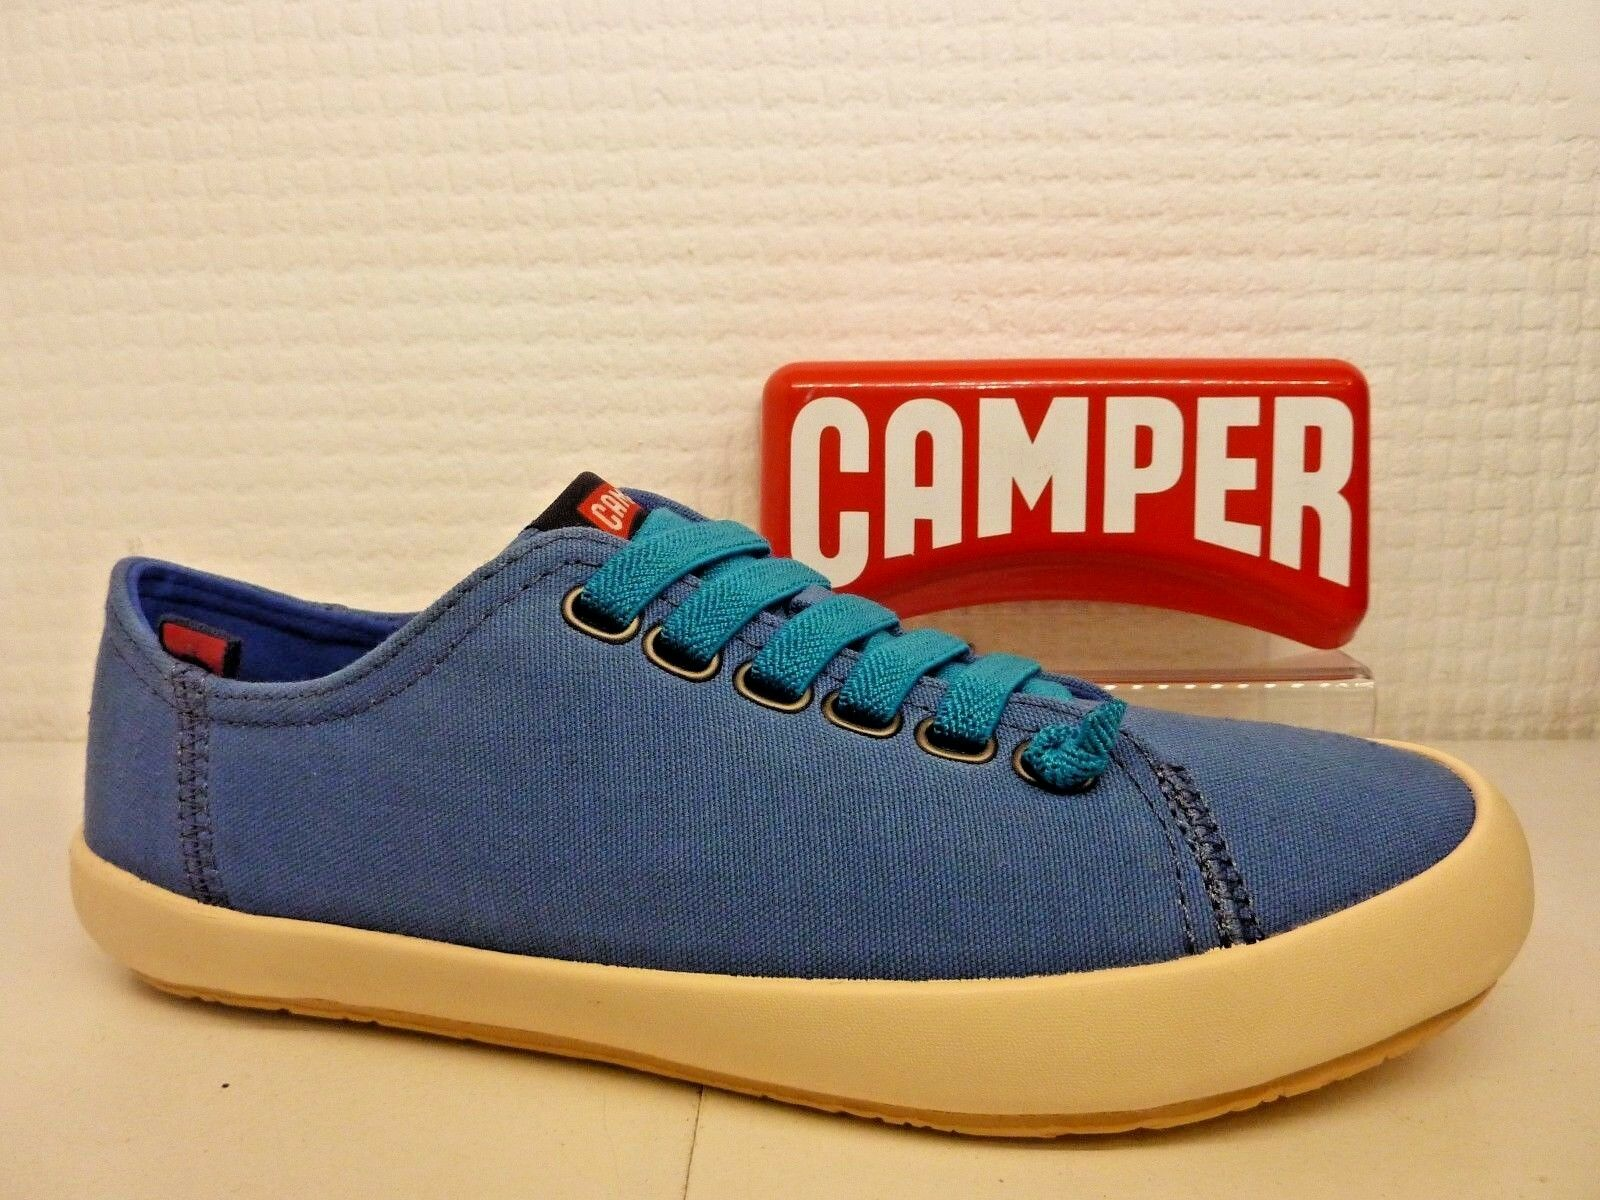 ab019f80ee4e7 Camper Borne K200284-008 Bleu Textile élastique dentelle Sneaker Femmes  Chaussures Chaussures Chaussures 94b93f